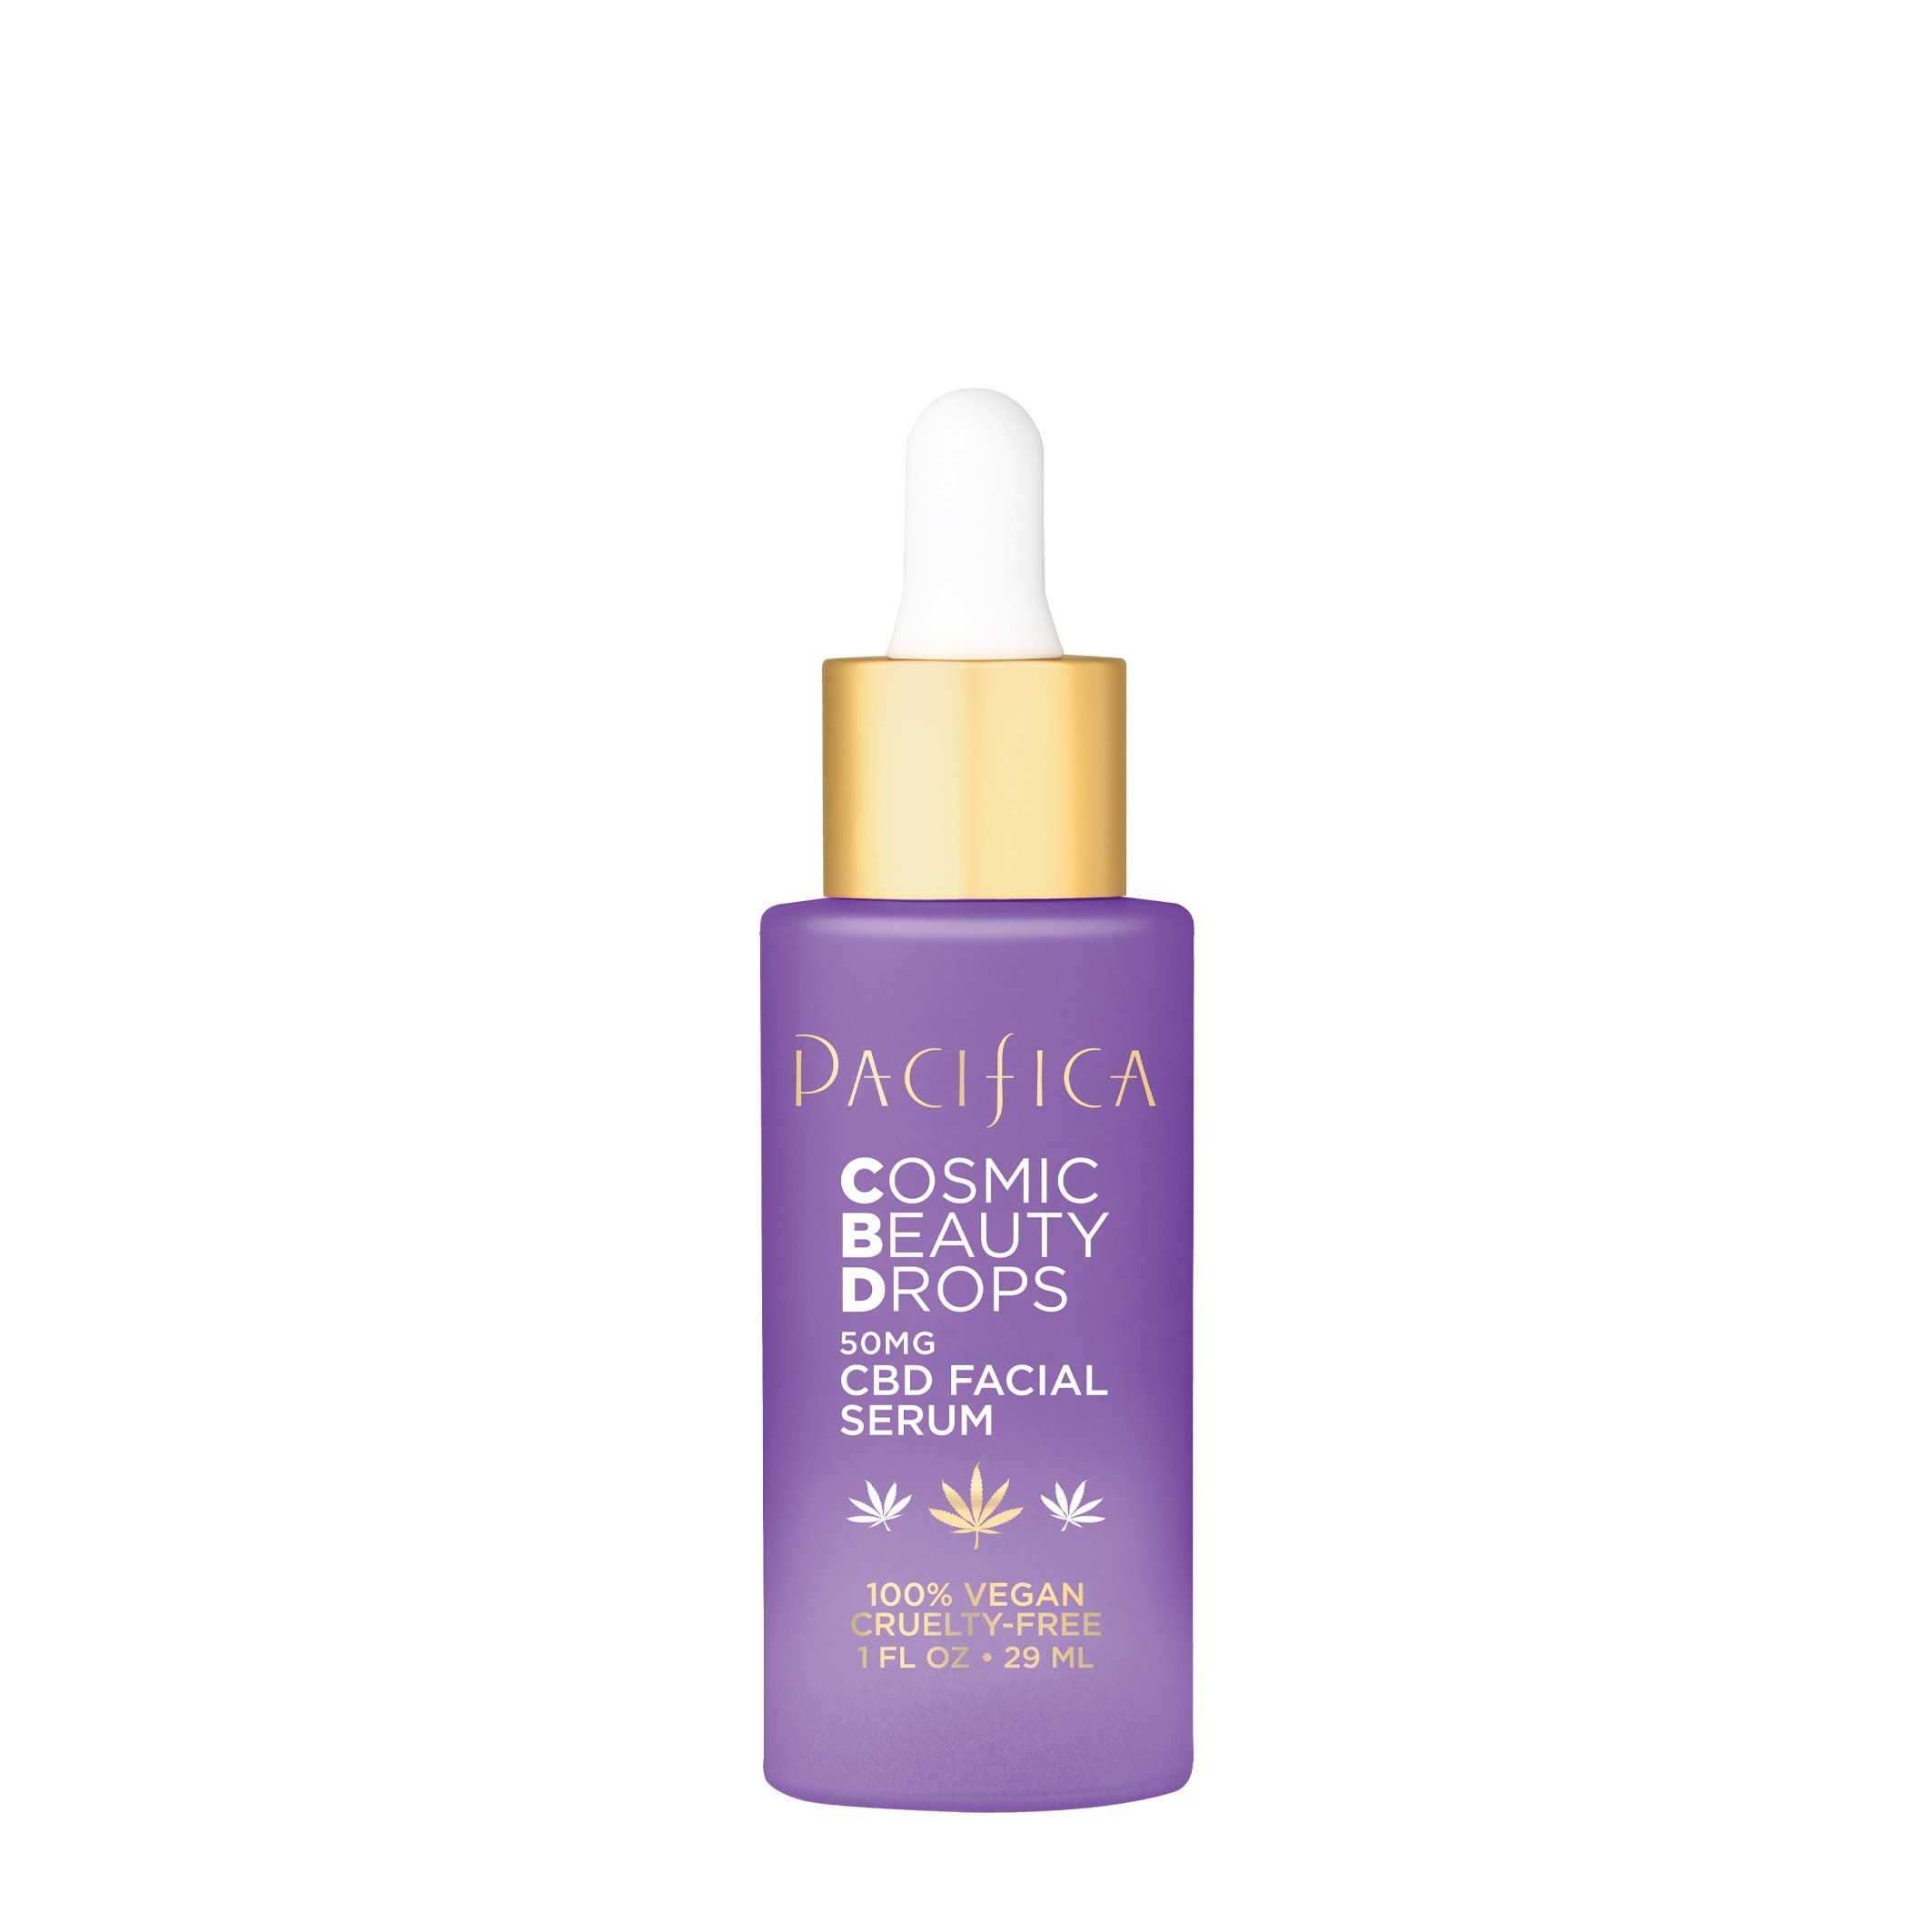 Cosmic Beauty Drops Cbd Balancing Serum In 2020 Serum Polysorbate 20 Skin Health